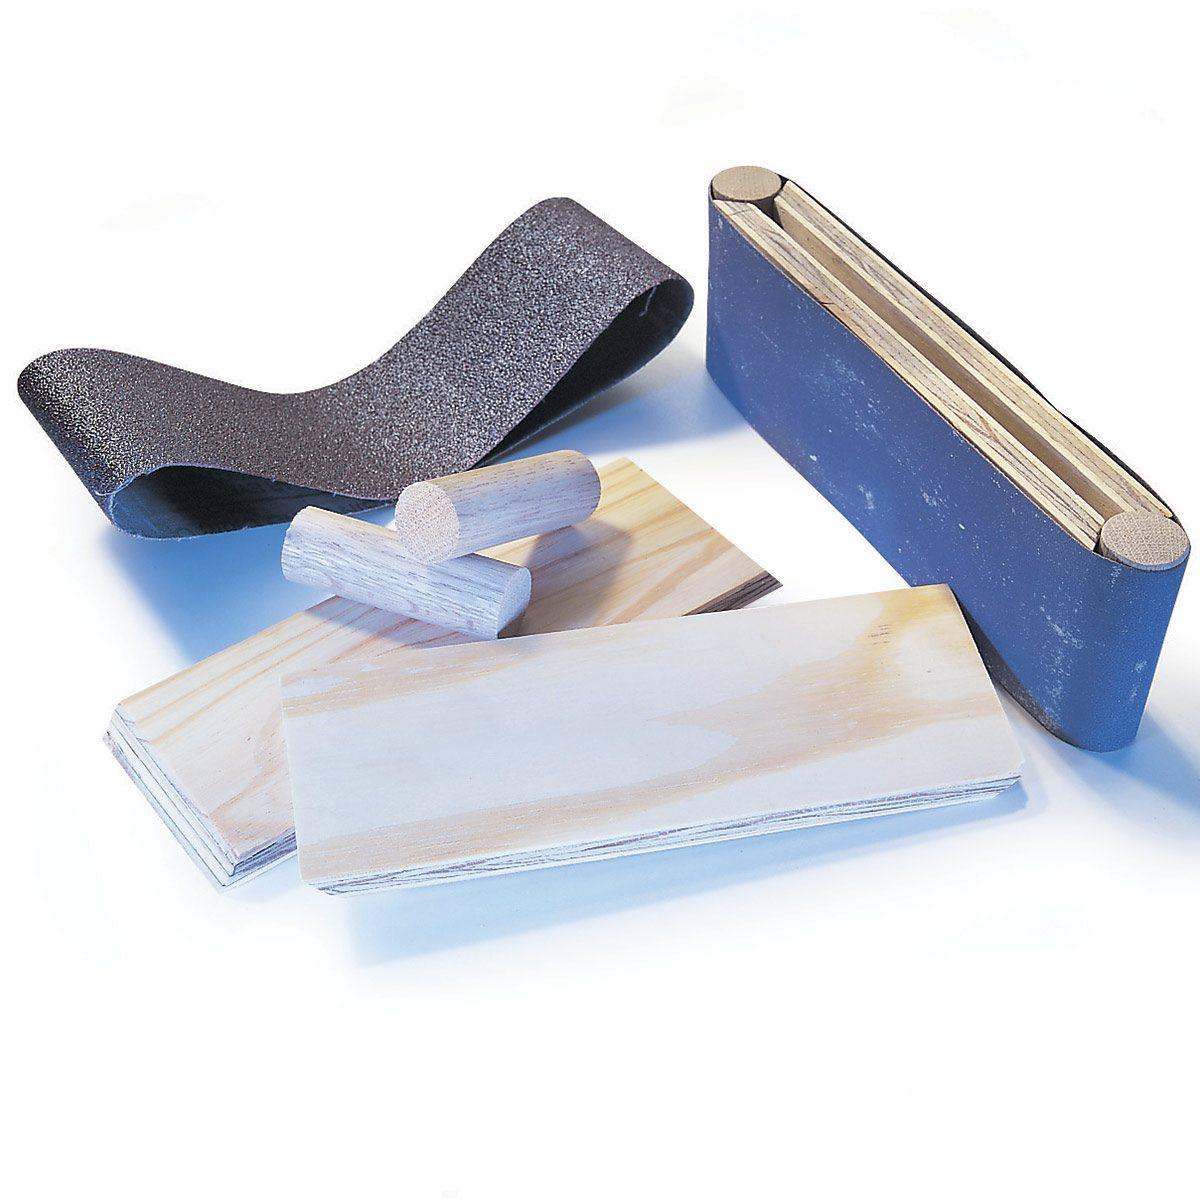 sanding block with dowels